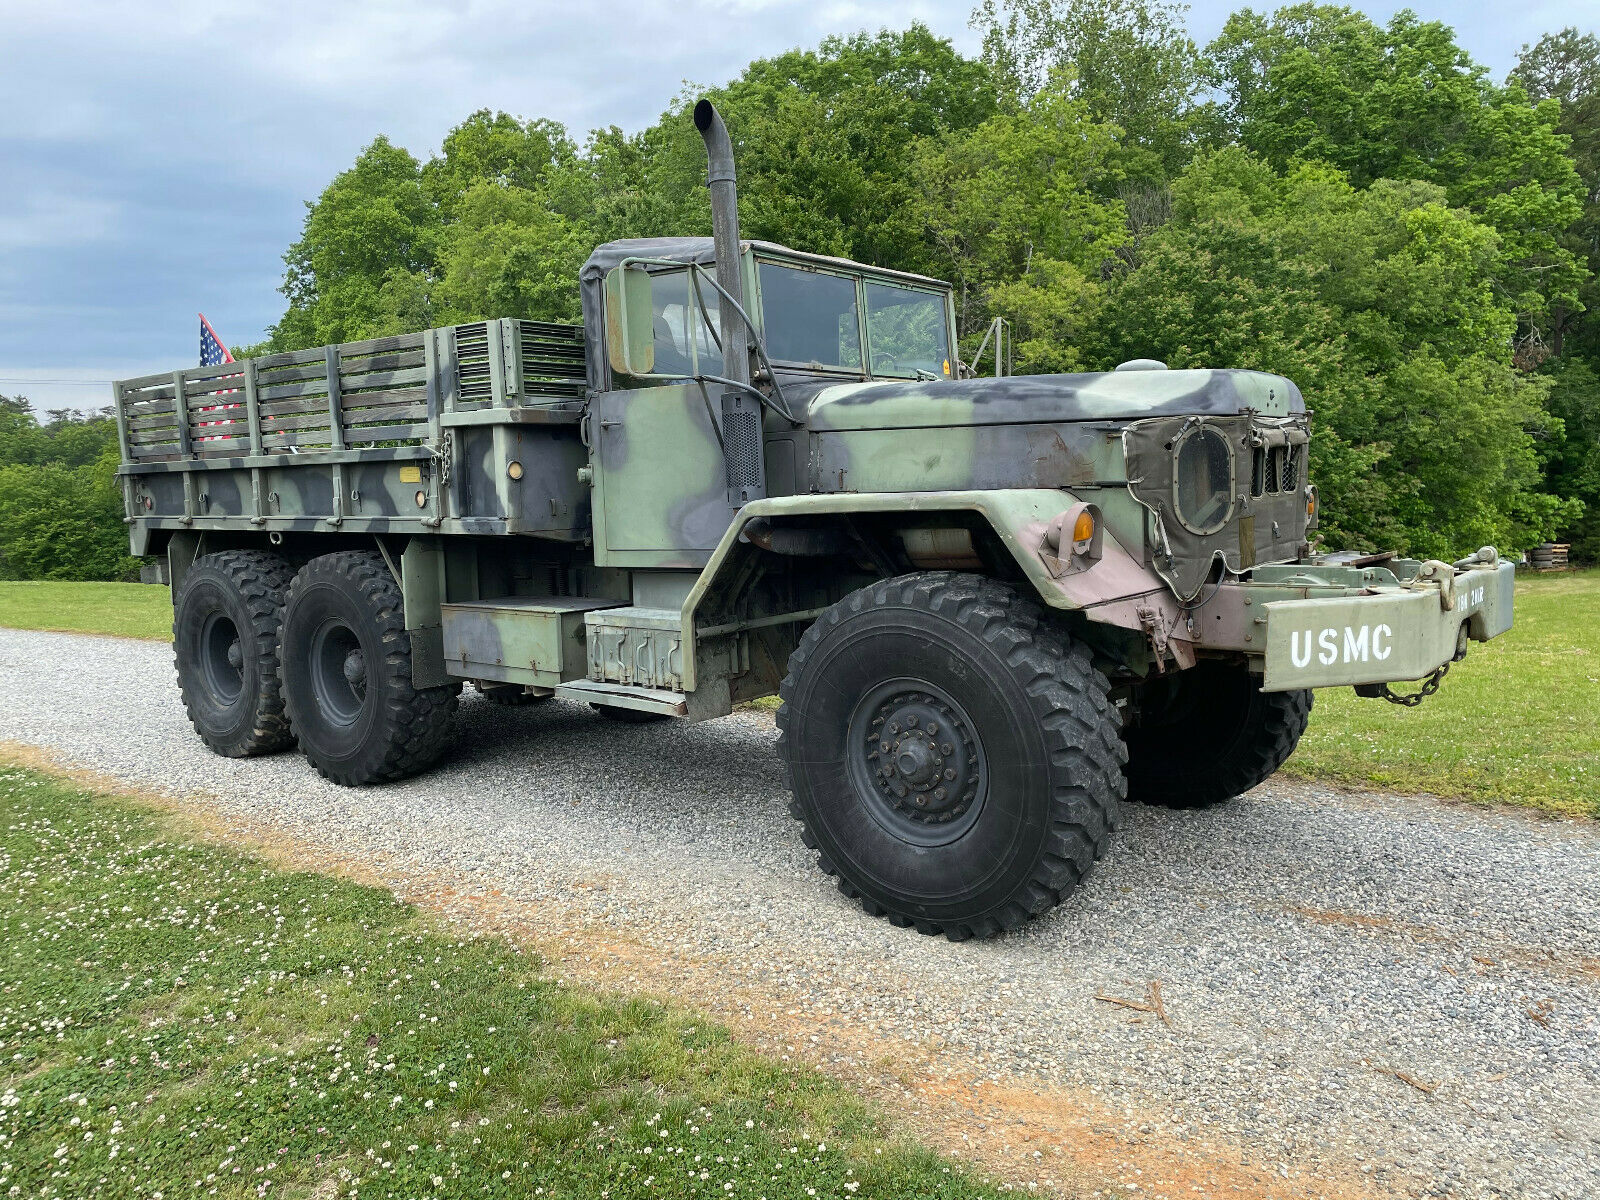 1971 M813A1 5 Ton 53 inch Tires